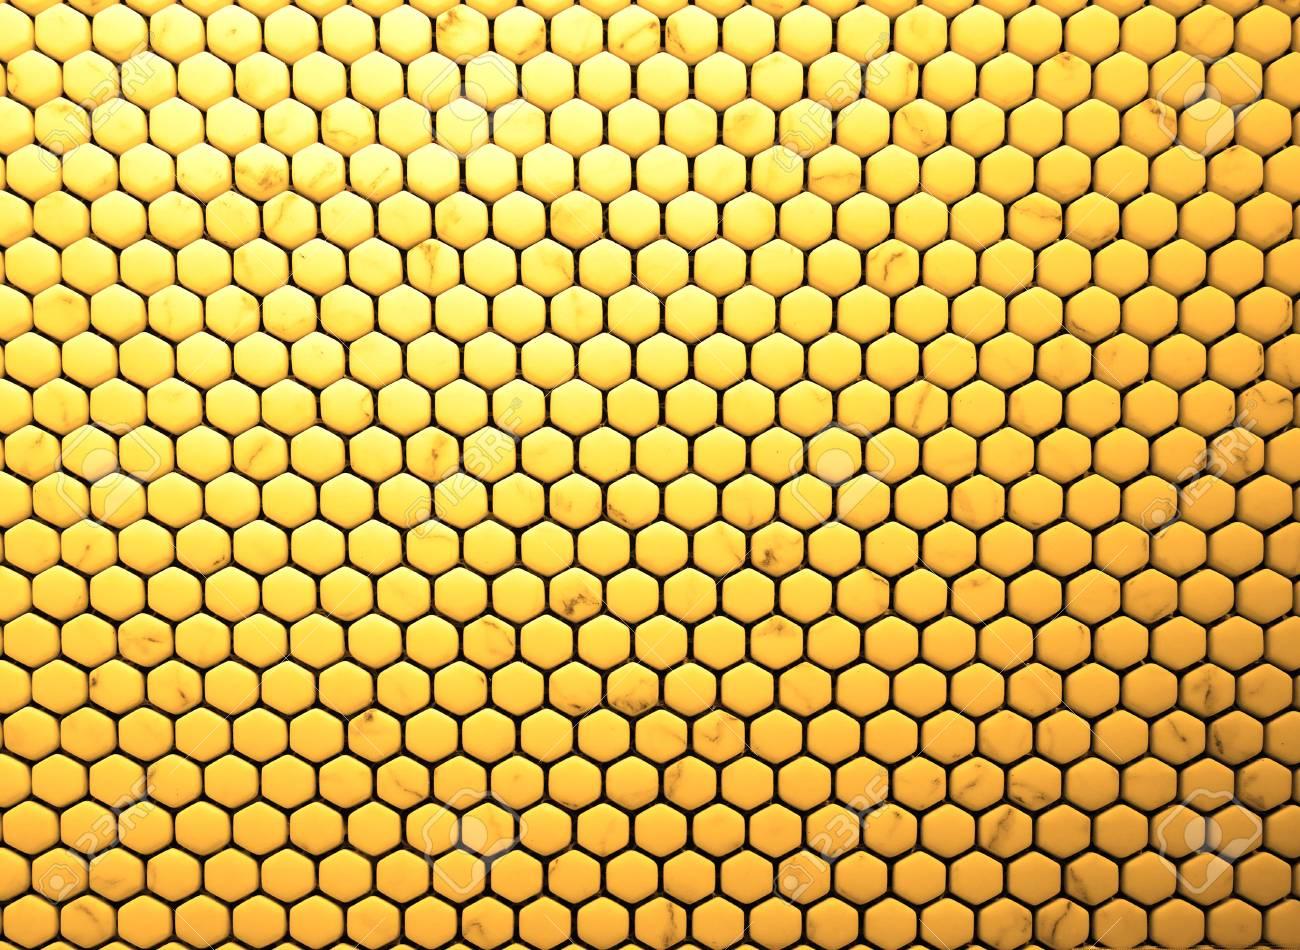 ceramic tiles texture hexagon honeycomb pattern background